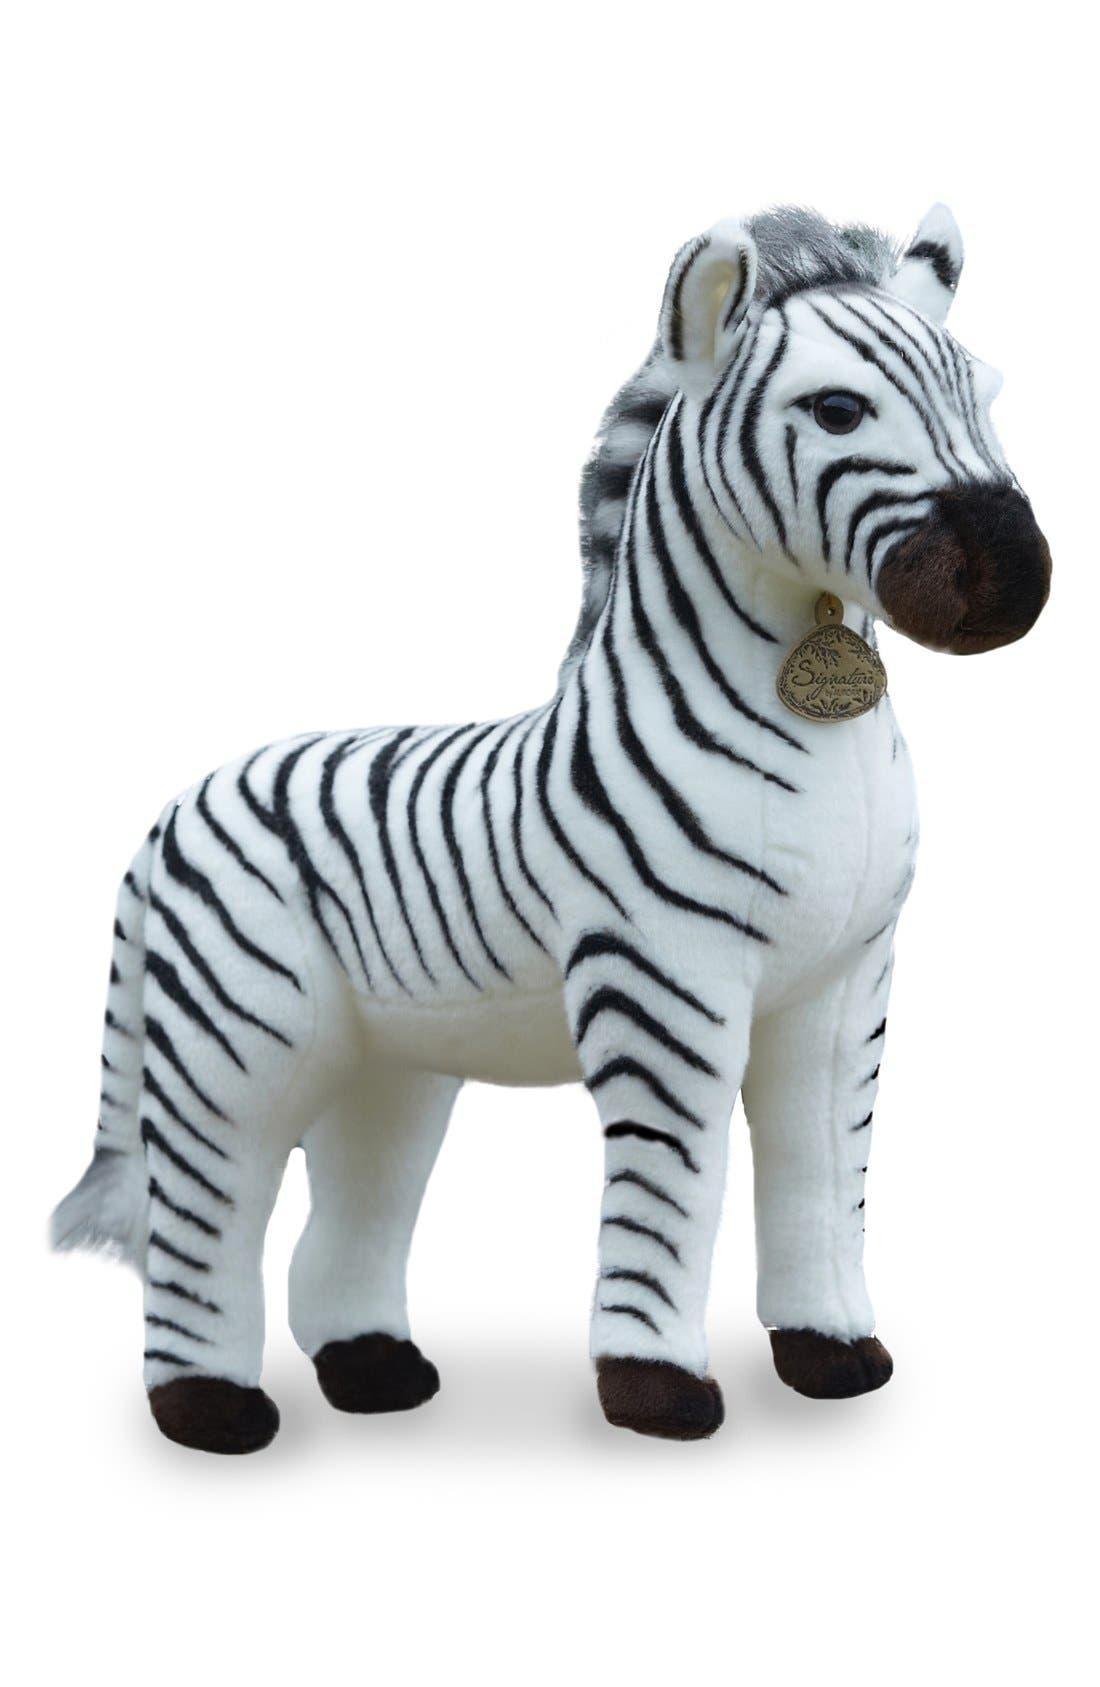 'Grevy's Zebra' Stuffed Animal,                             Main thumbnail 1, color,                             BLACK